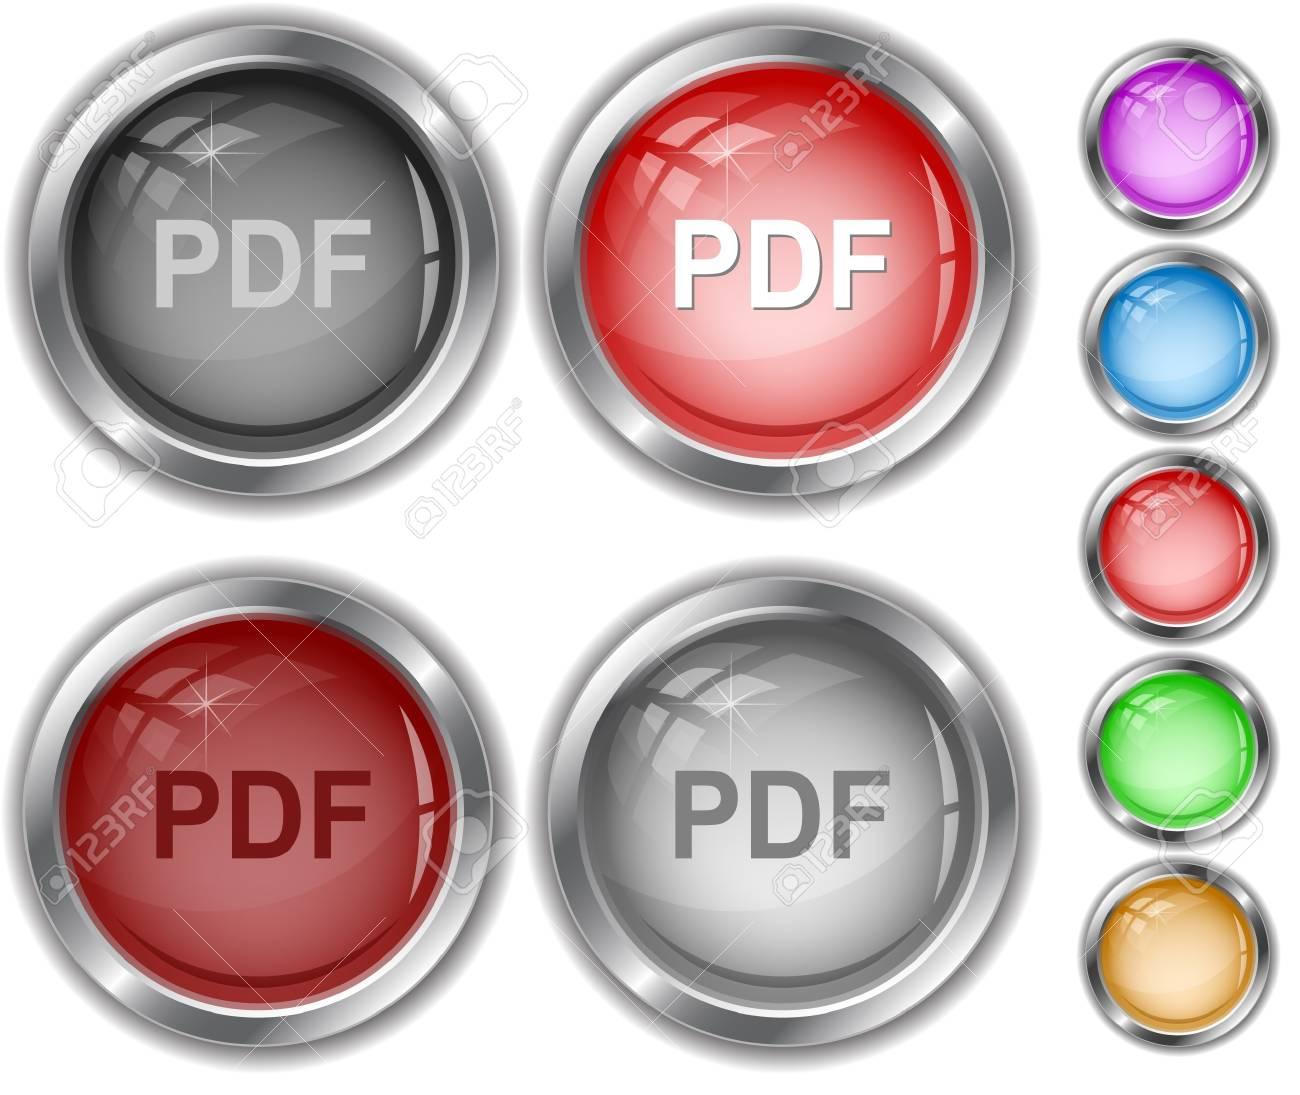 Pdf. internet buttons. Stock Vector - 7302168